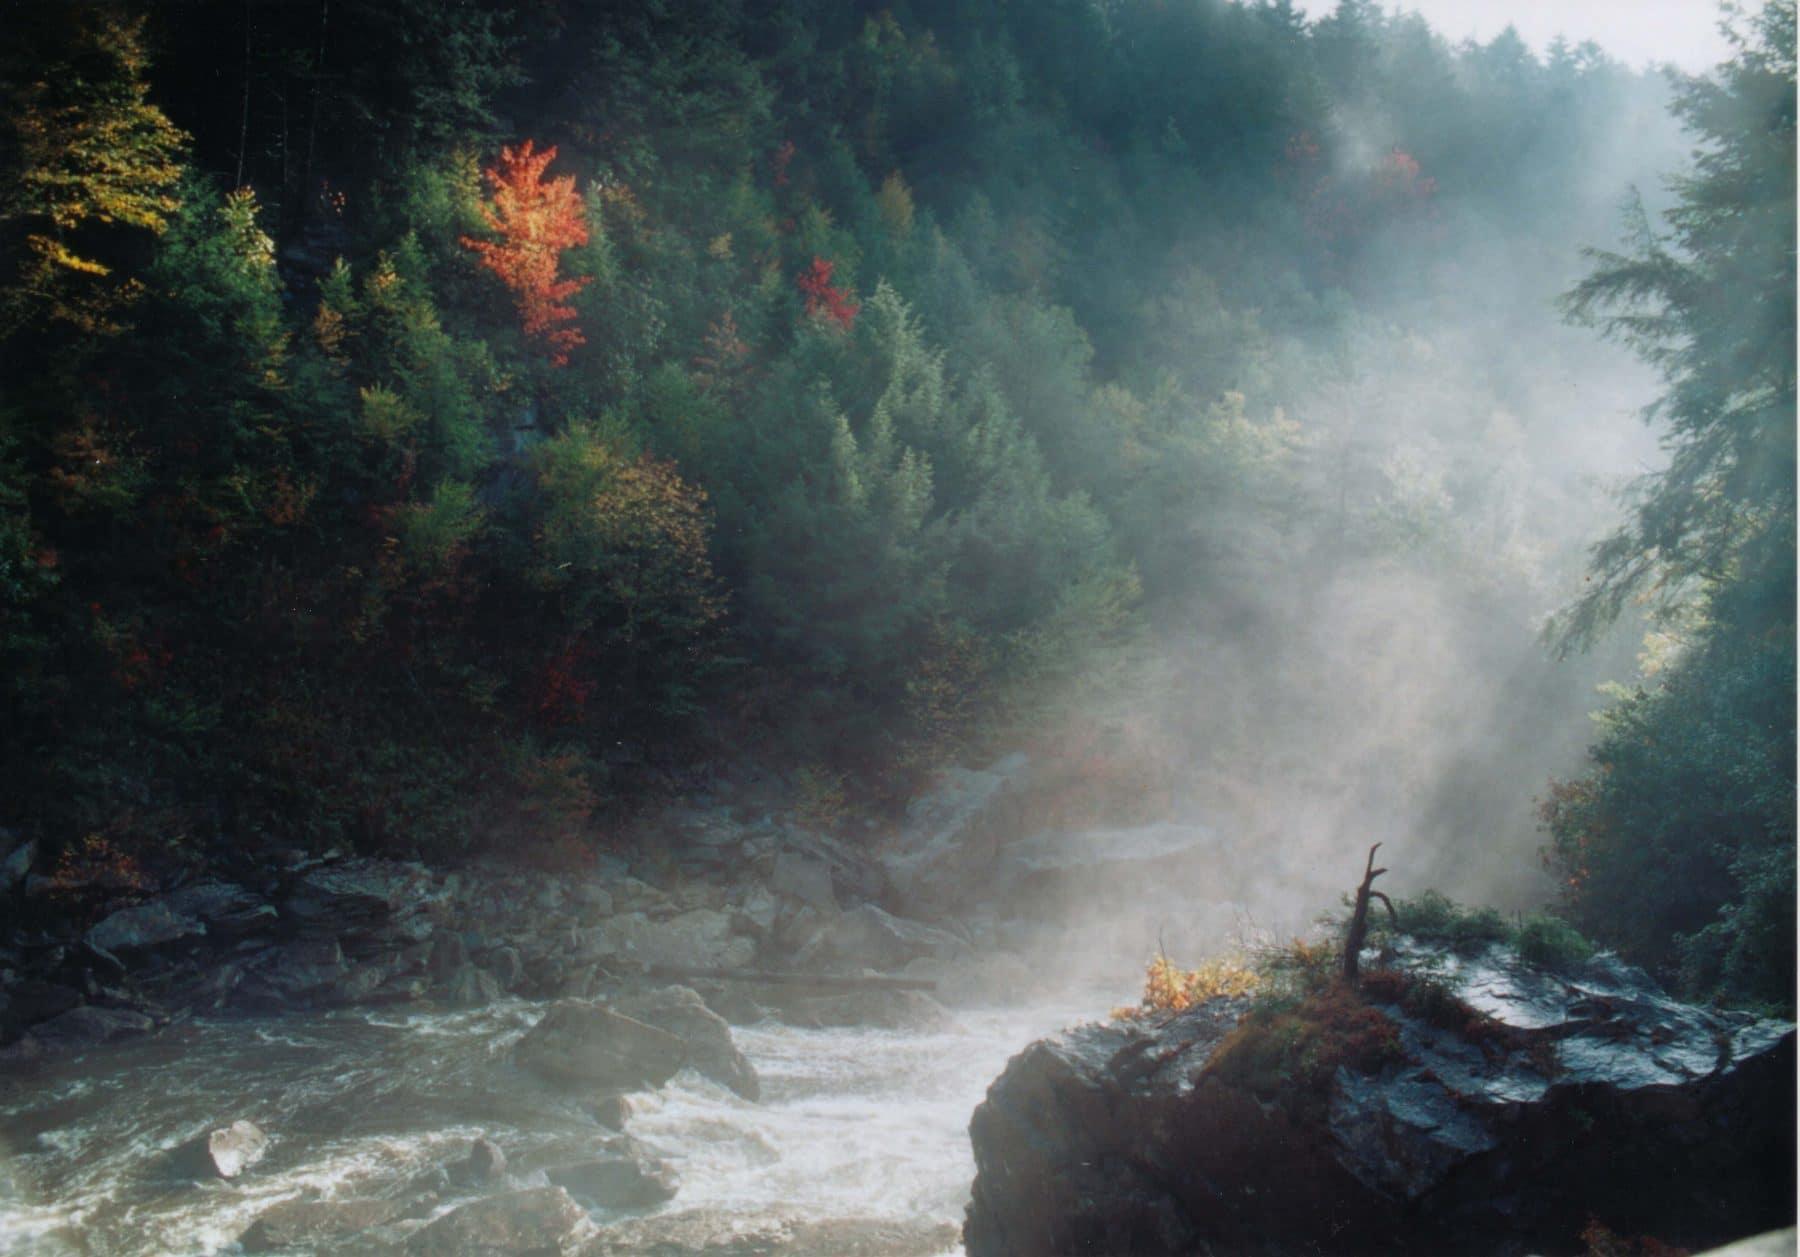 mist below the falls of the Blackwater River